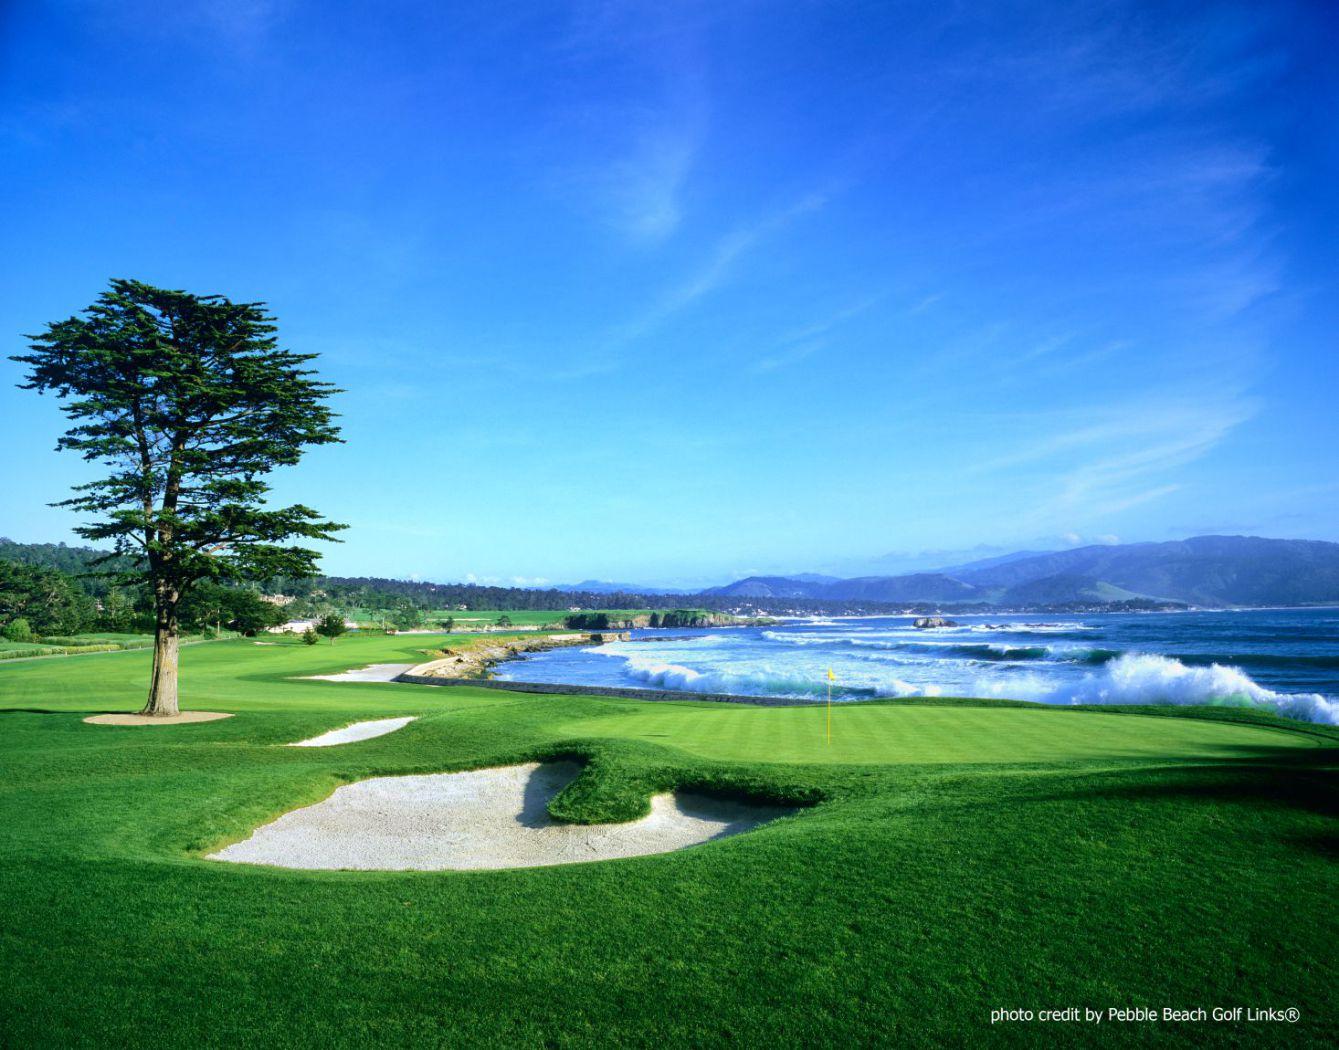 pebble-beach-golf-links-50